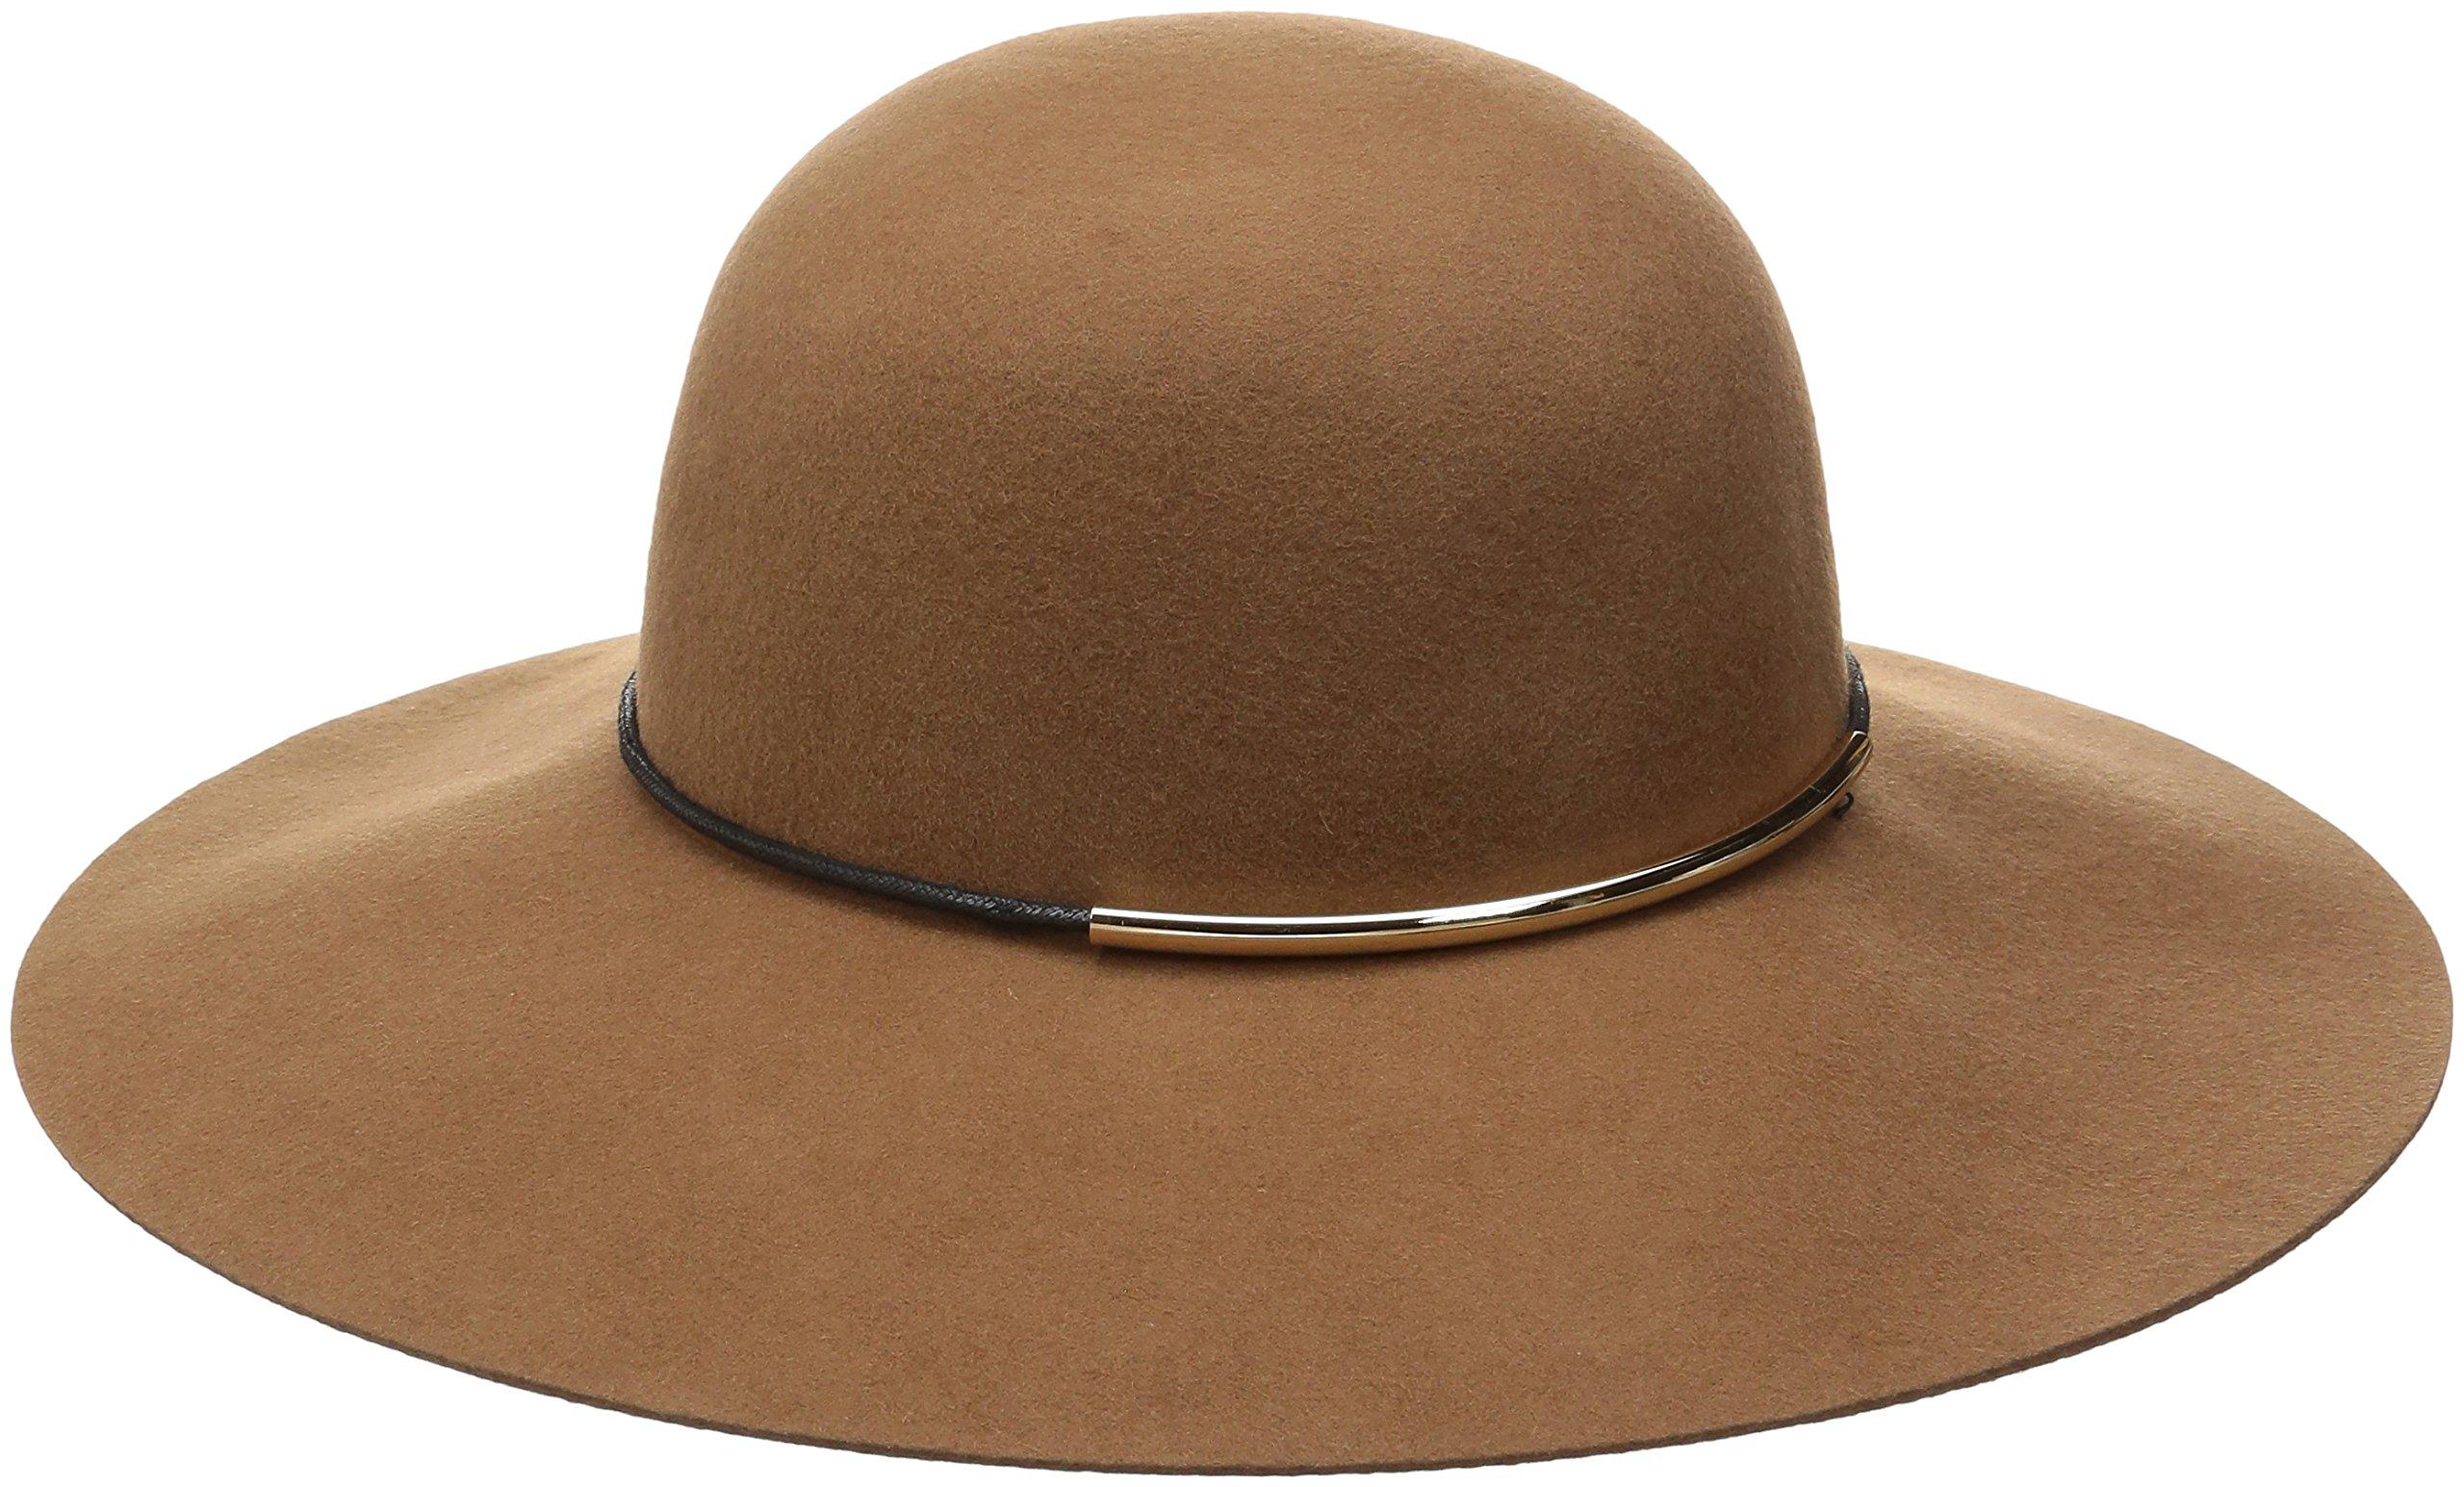 Nine West Women's Felt Floppy Hat with Metal Tube, Pecan, One Size